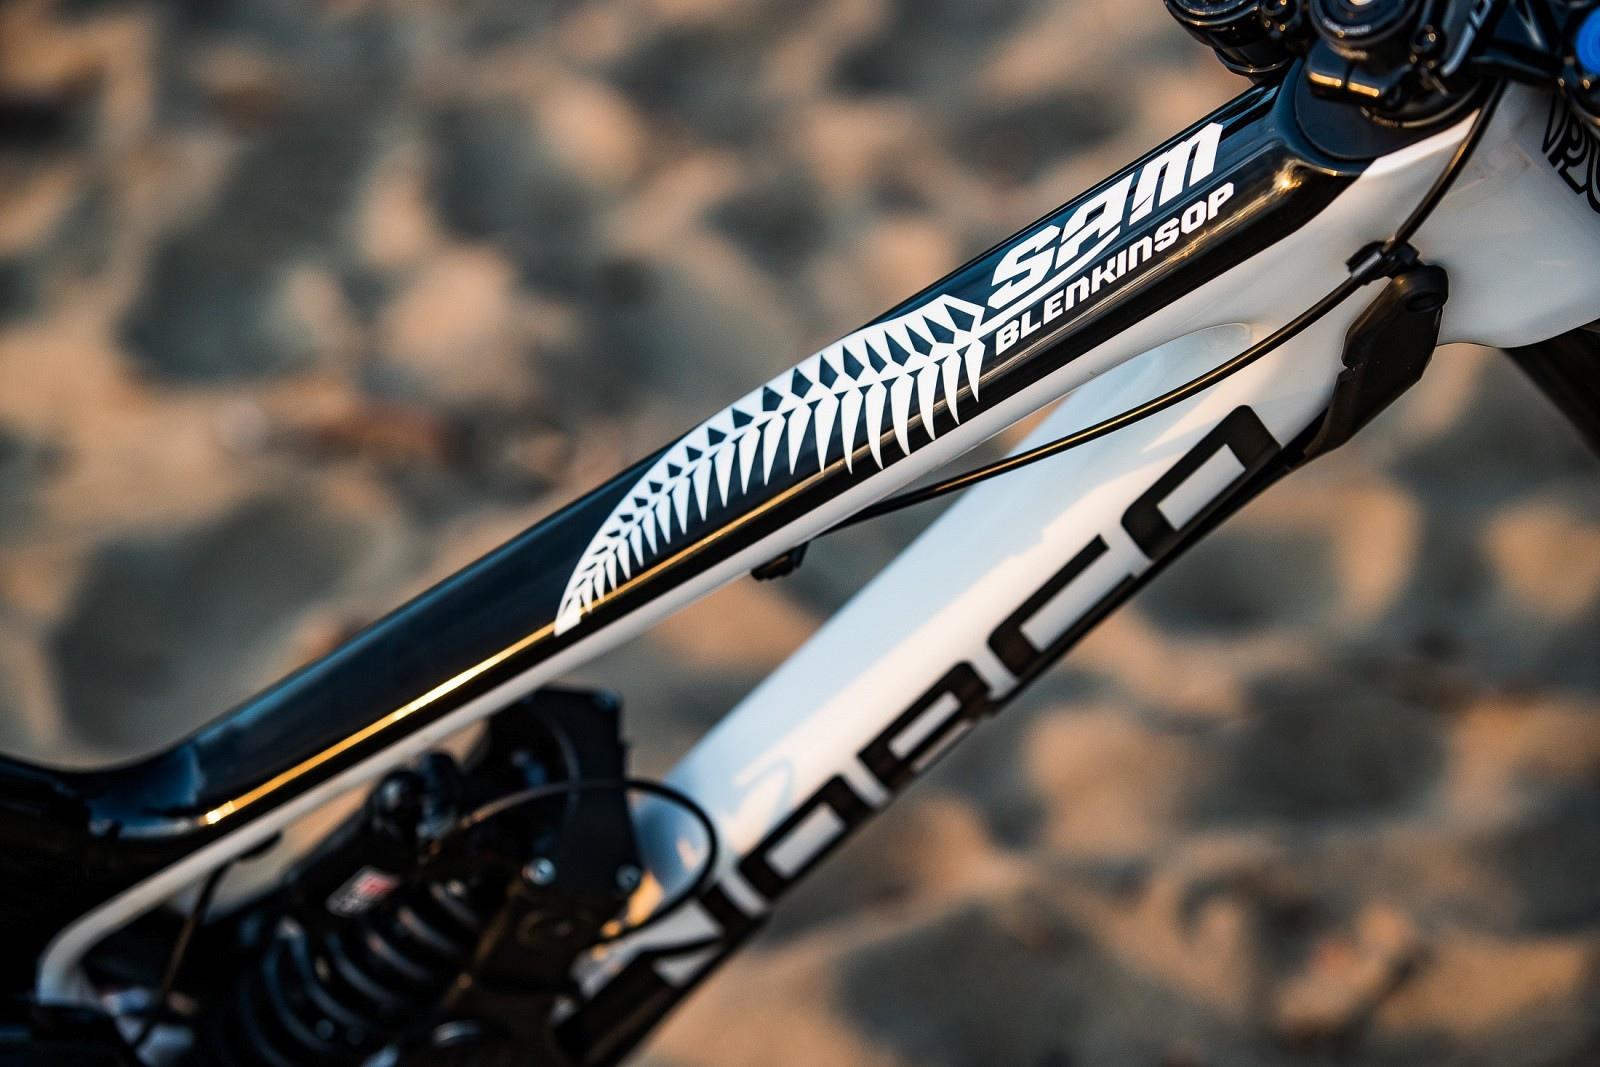 Norco Factory Racing. Sam Blenkinsop s Custom DH Bike Cairns World Champs